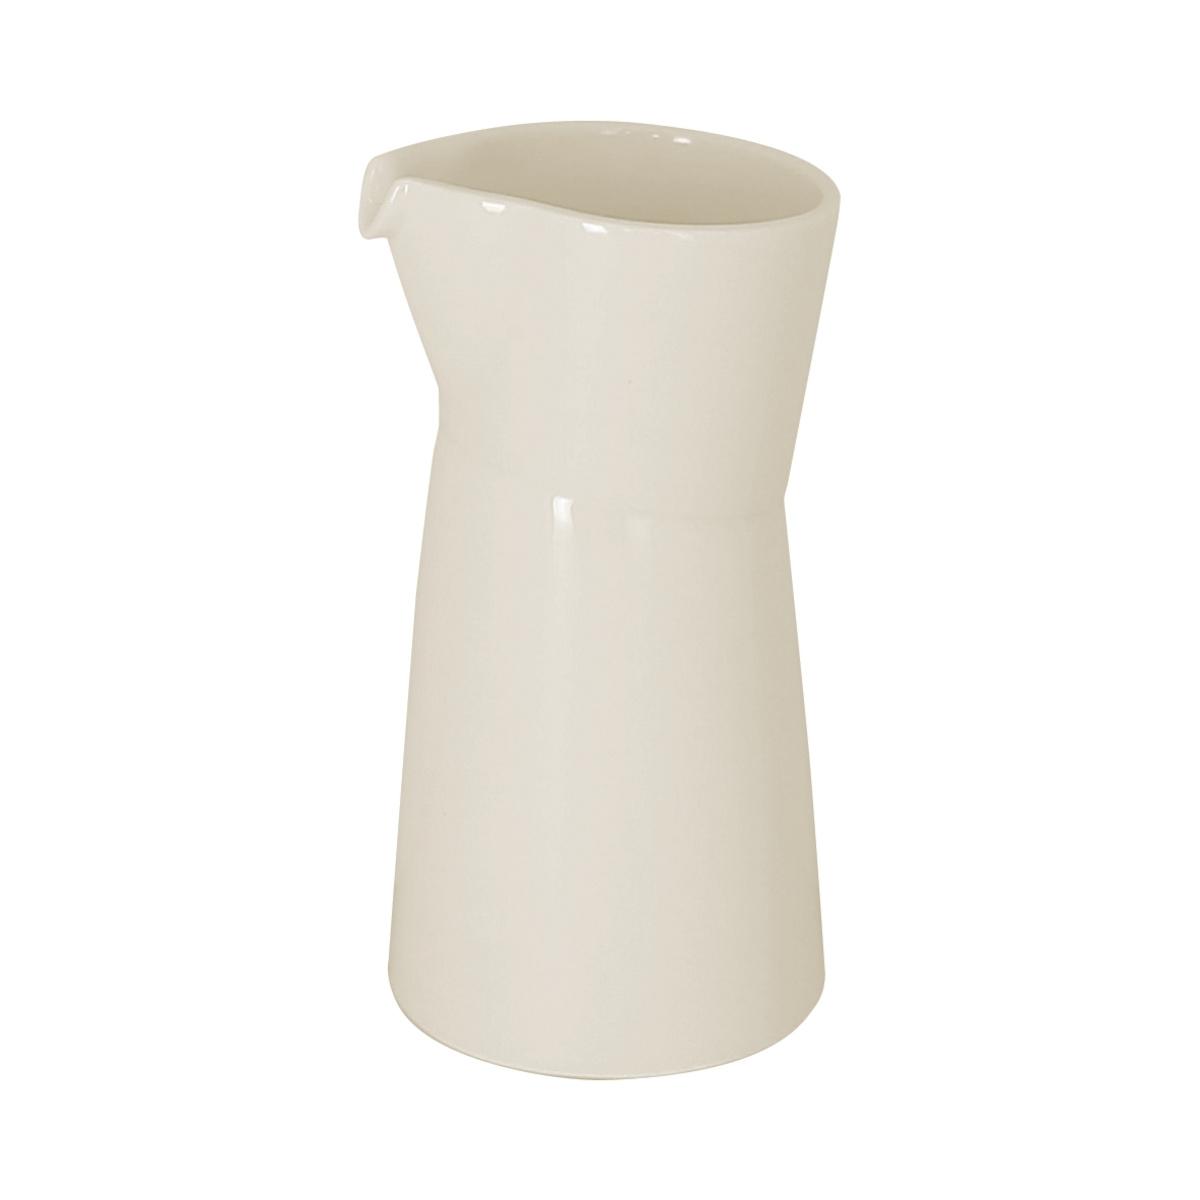 Pichet rond ivoire 25 cl Giro Rak